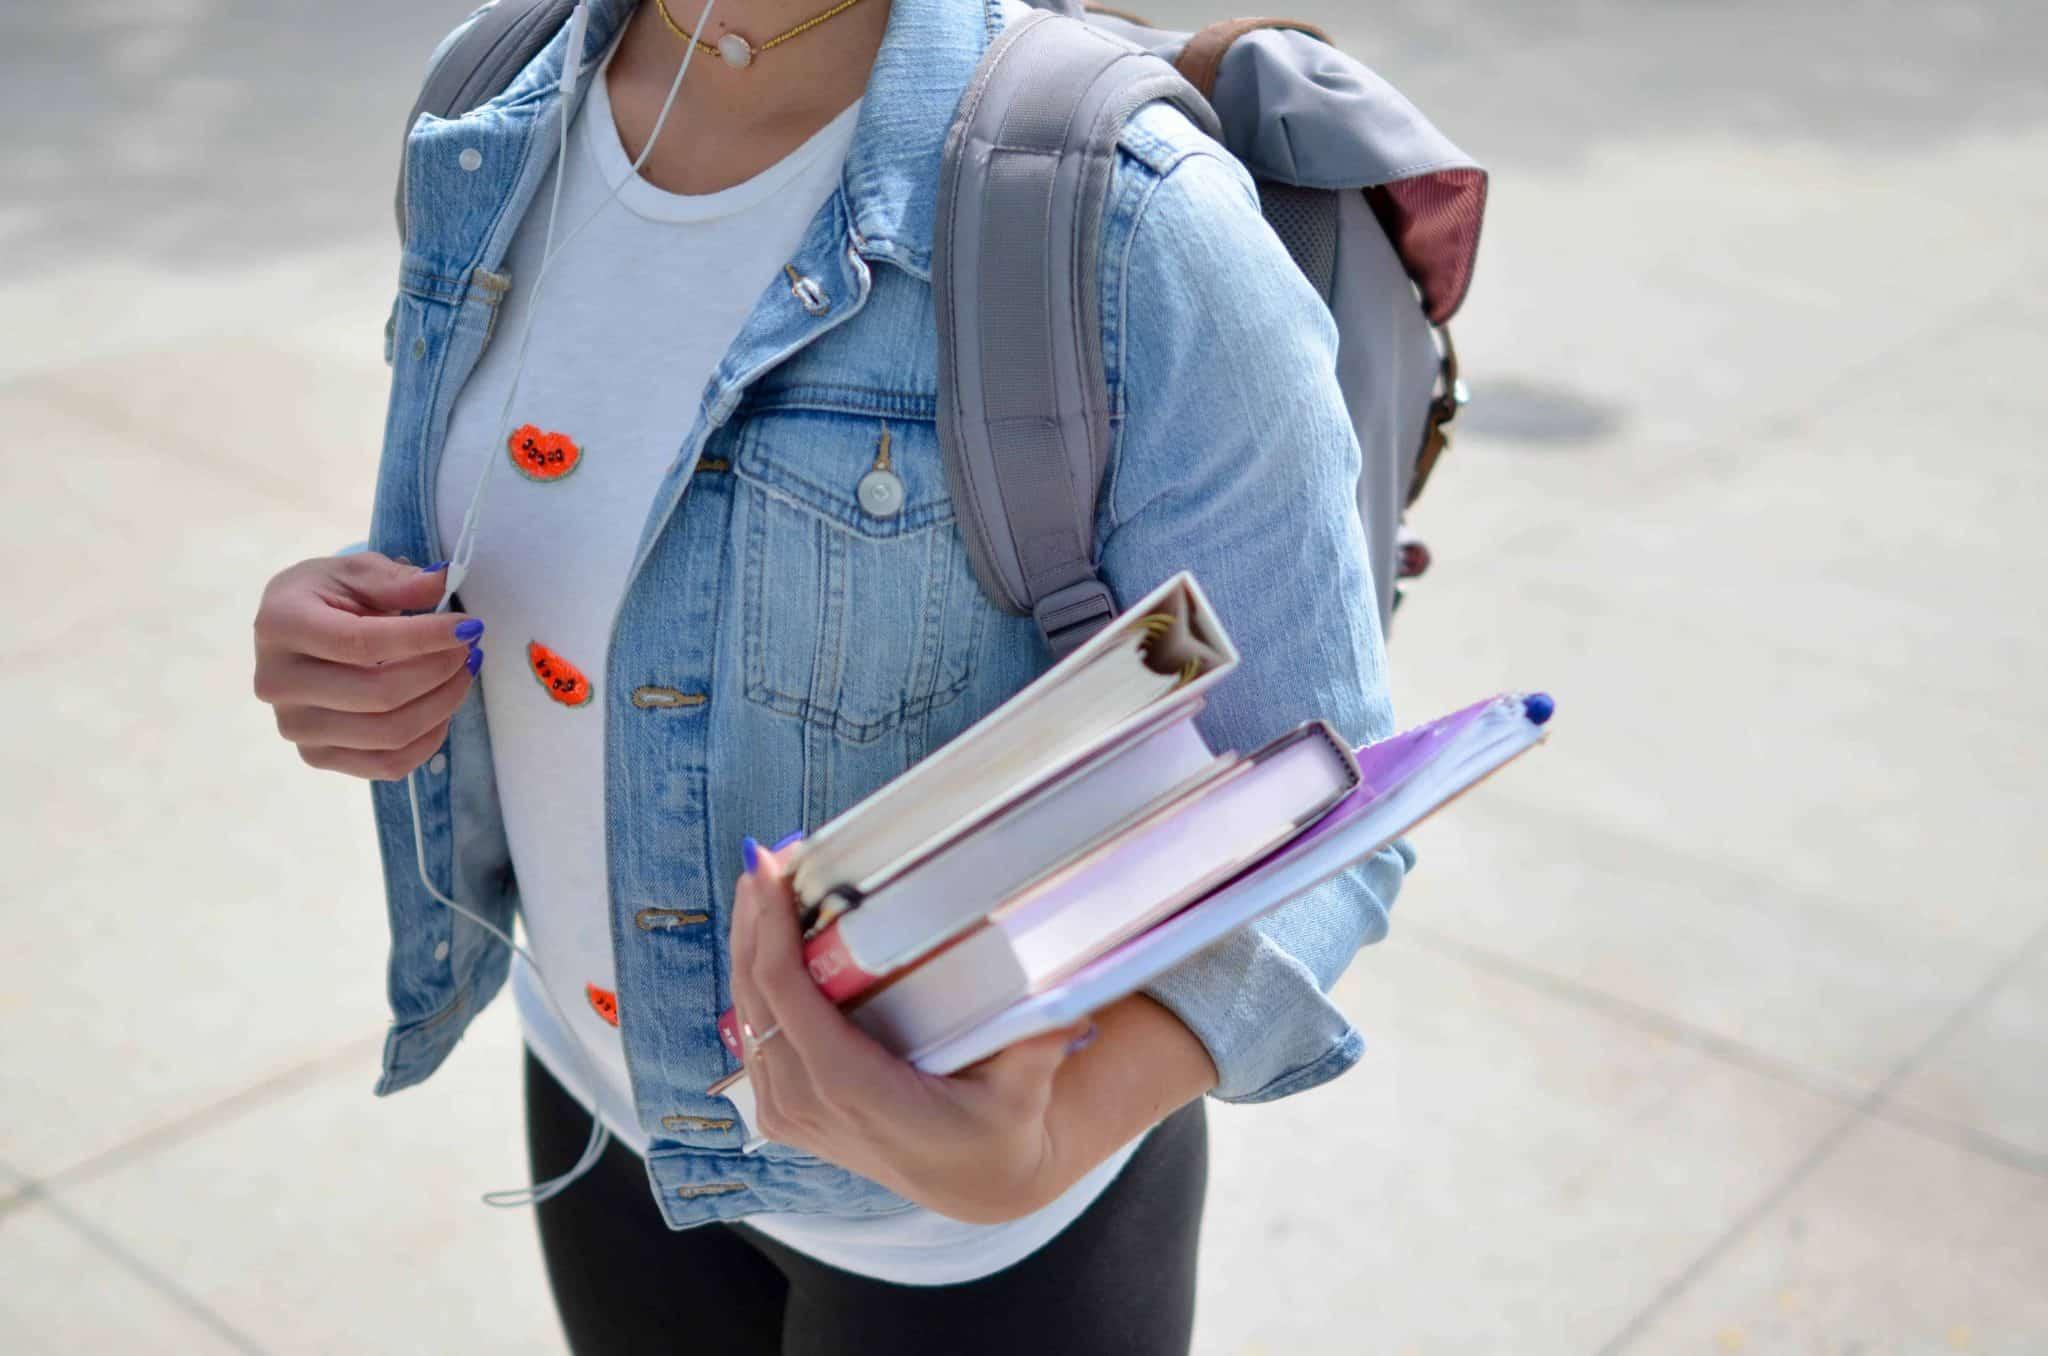 best money hacks - get a student discount card